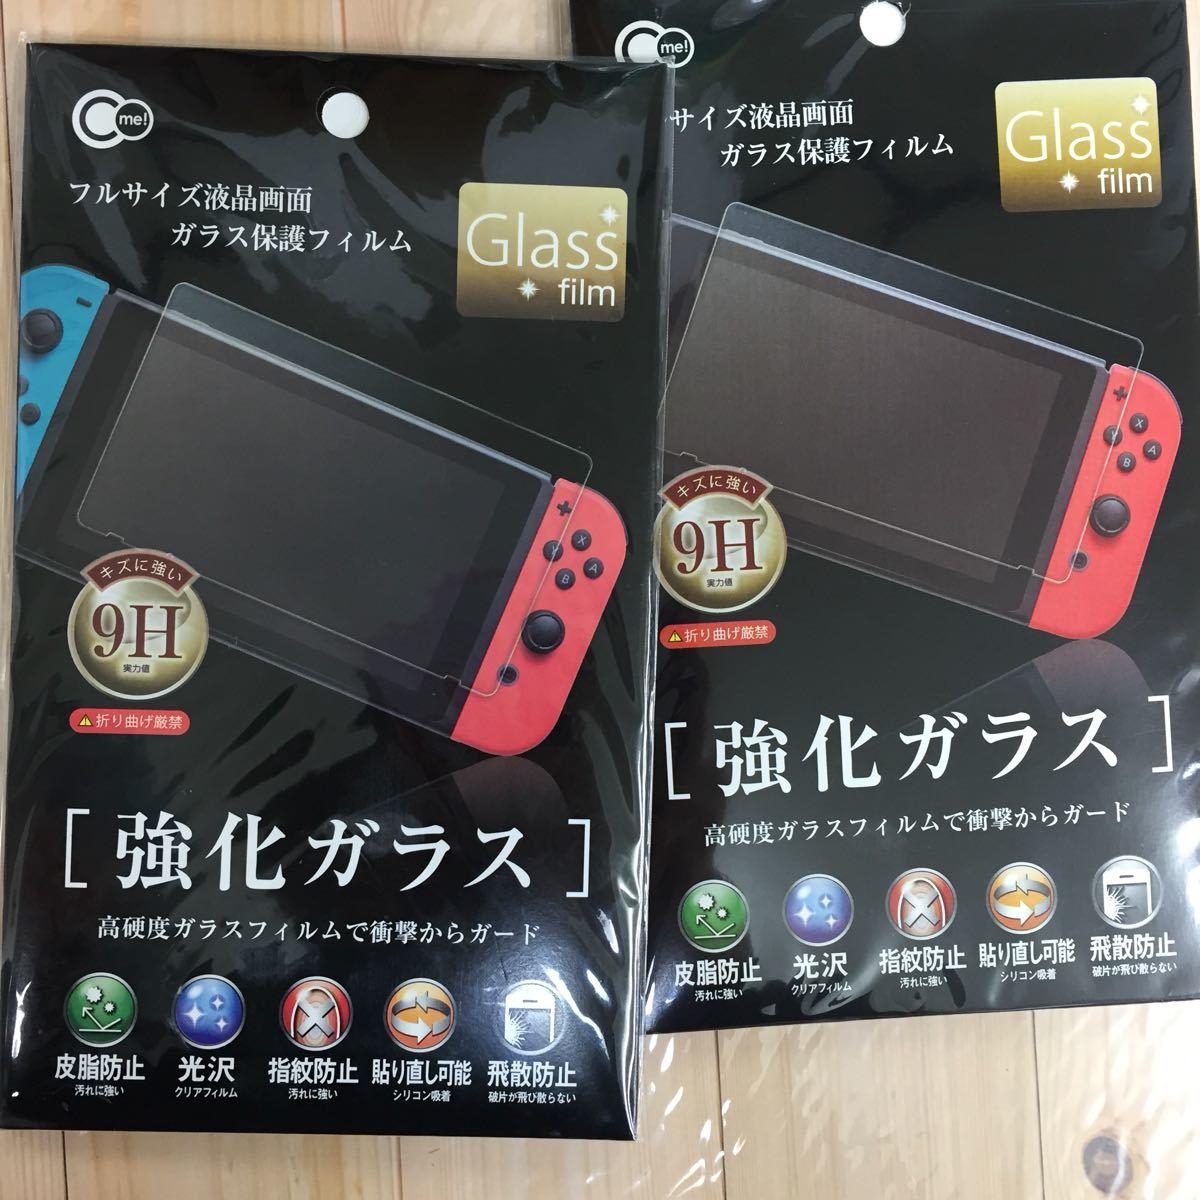 Nintendo Switch スイッチ 強化ガラス 保護フィルム